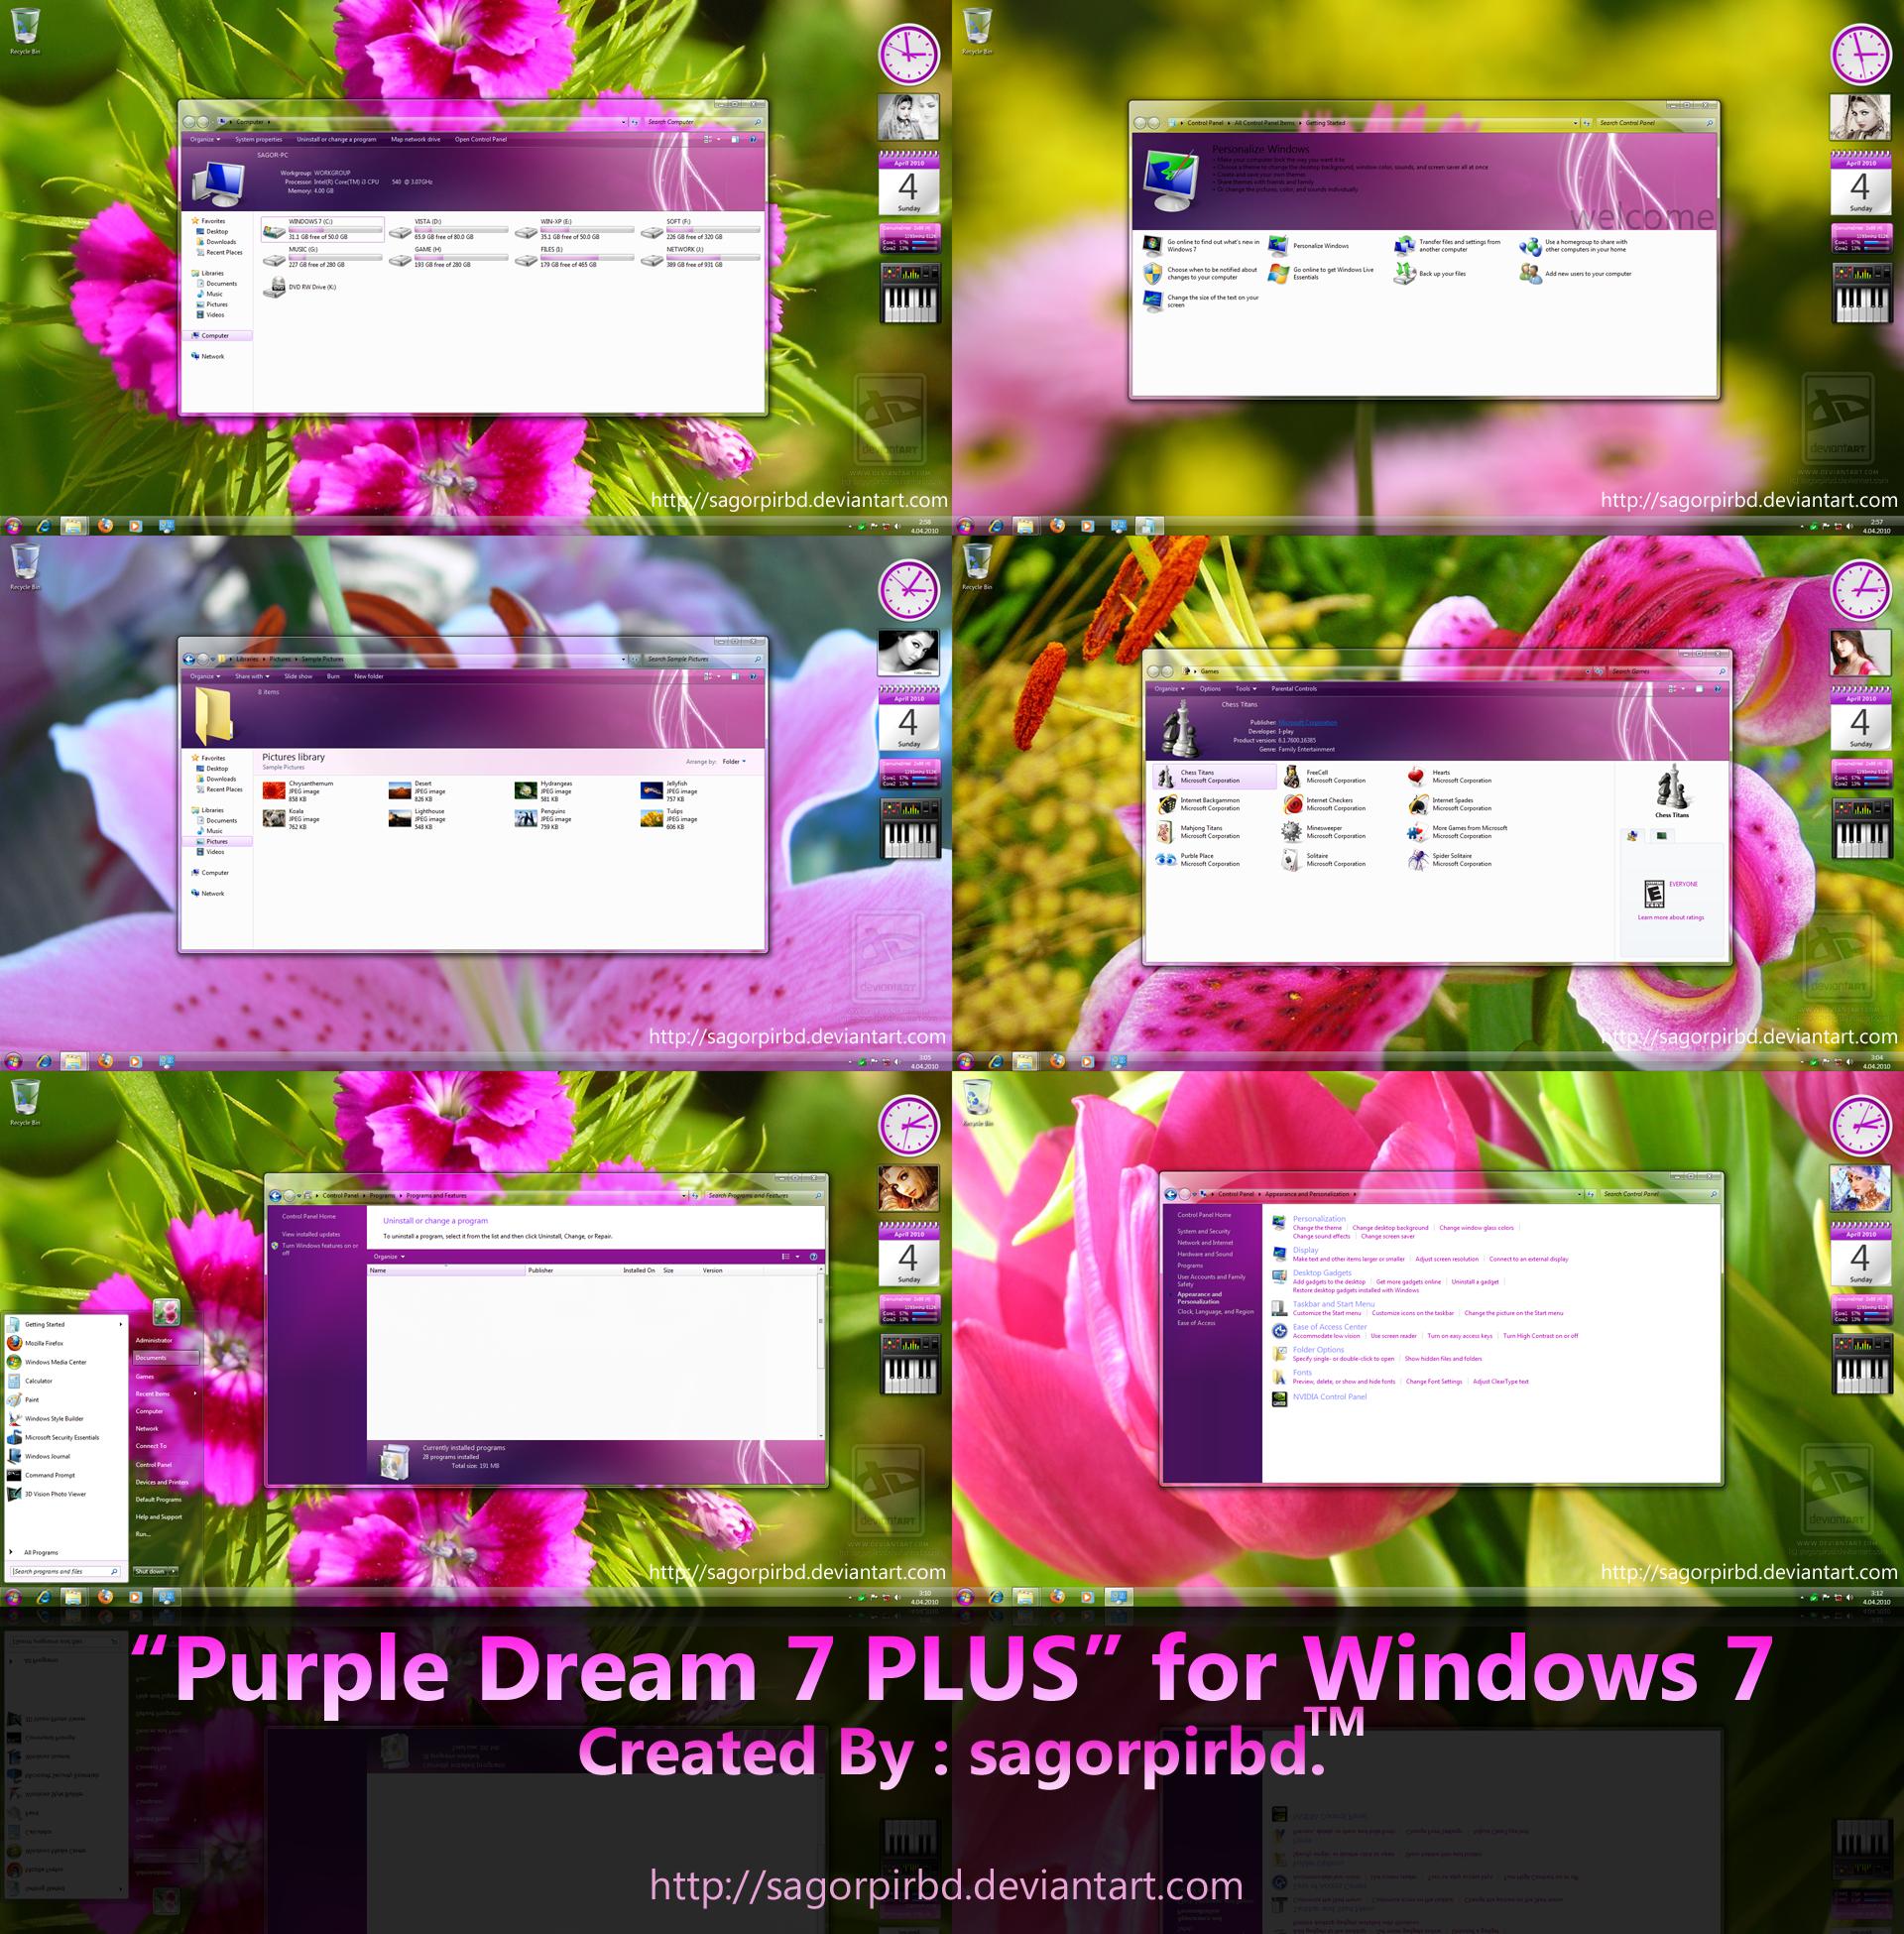 Purple Dream 7 PLUS for Win 7 by sagorpirbd